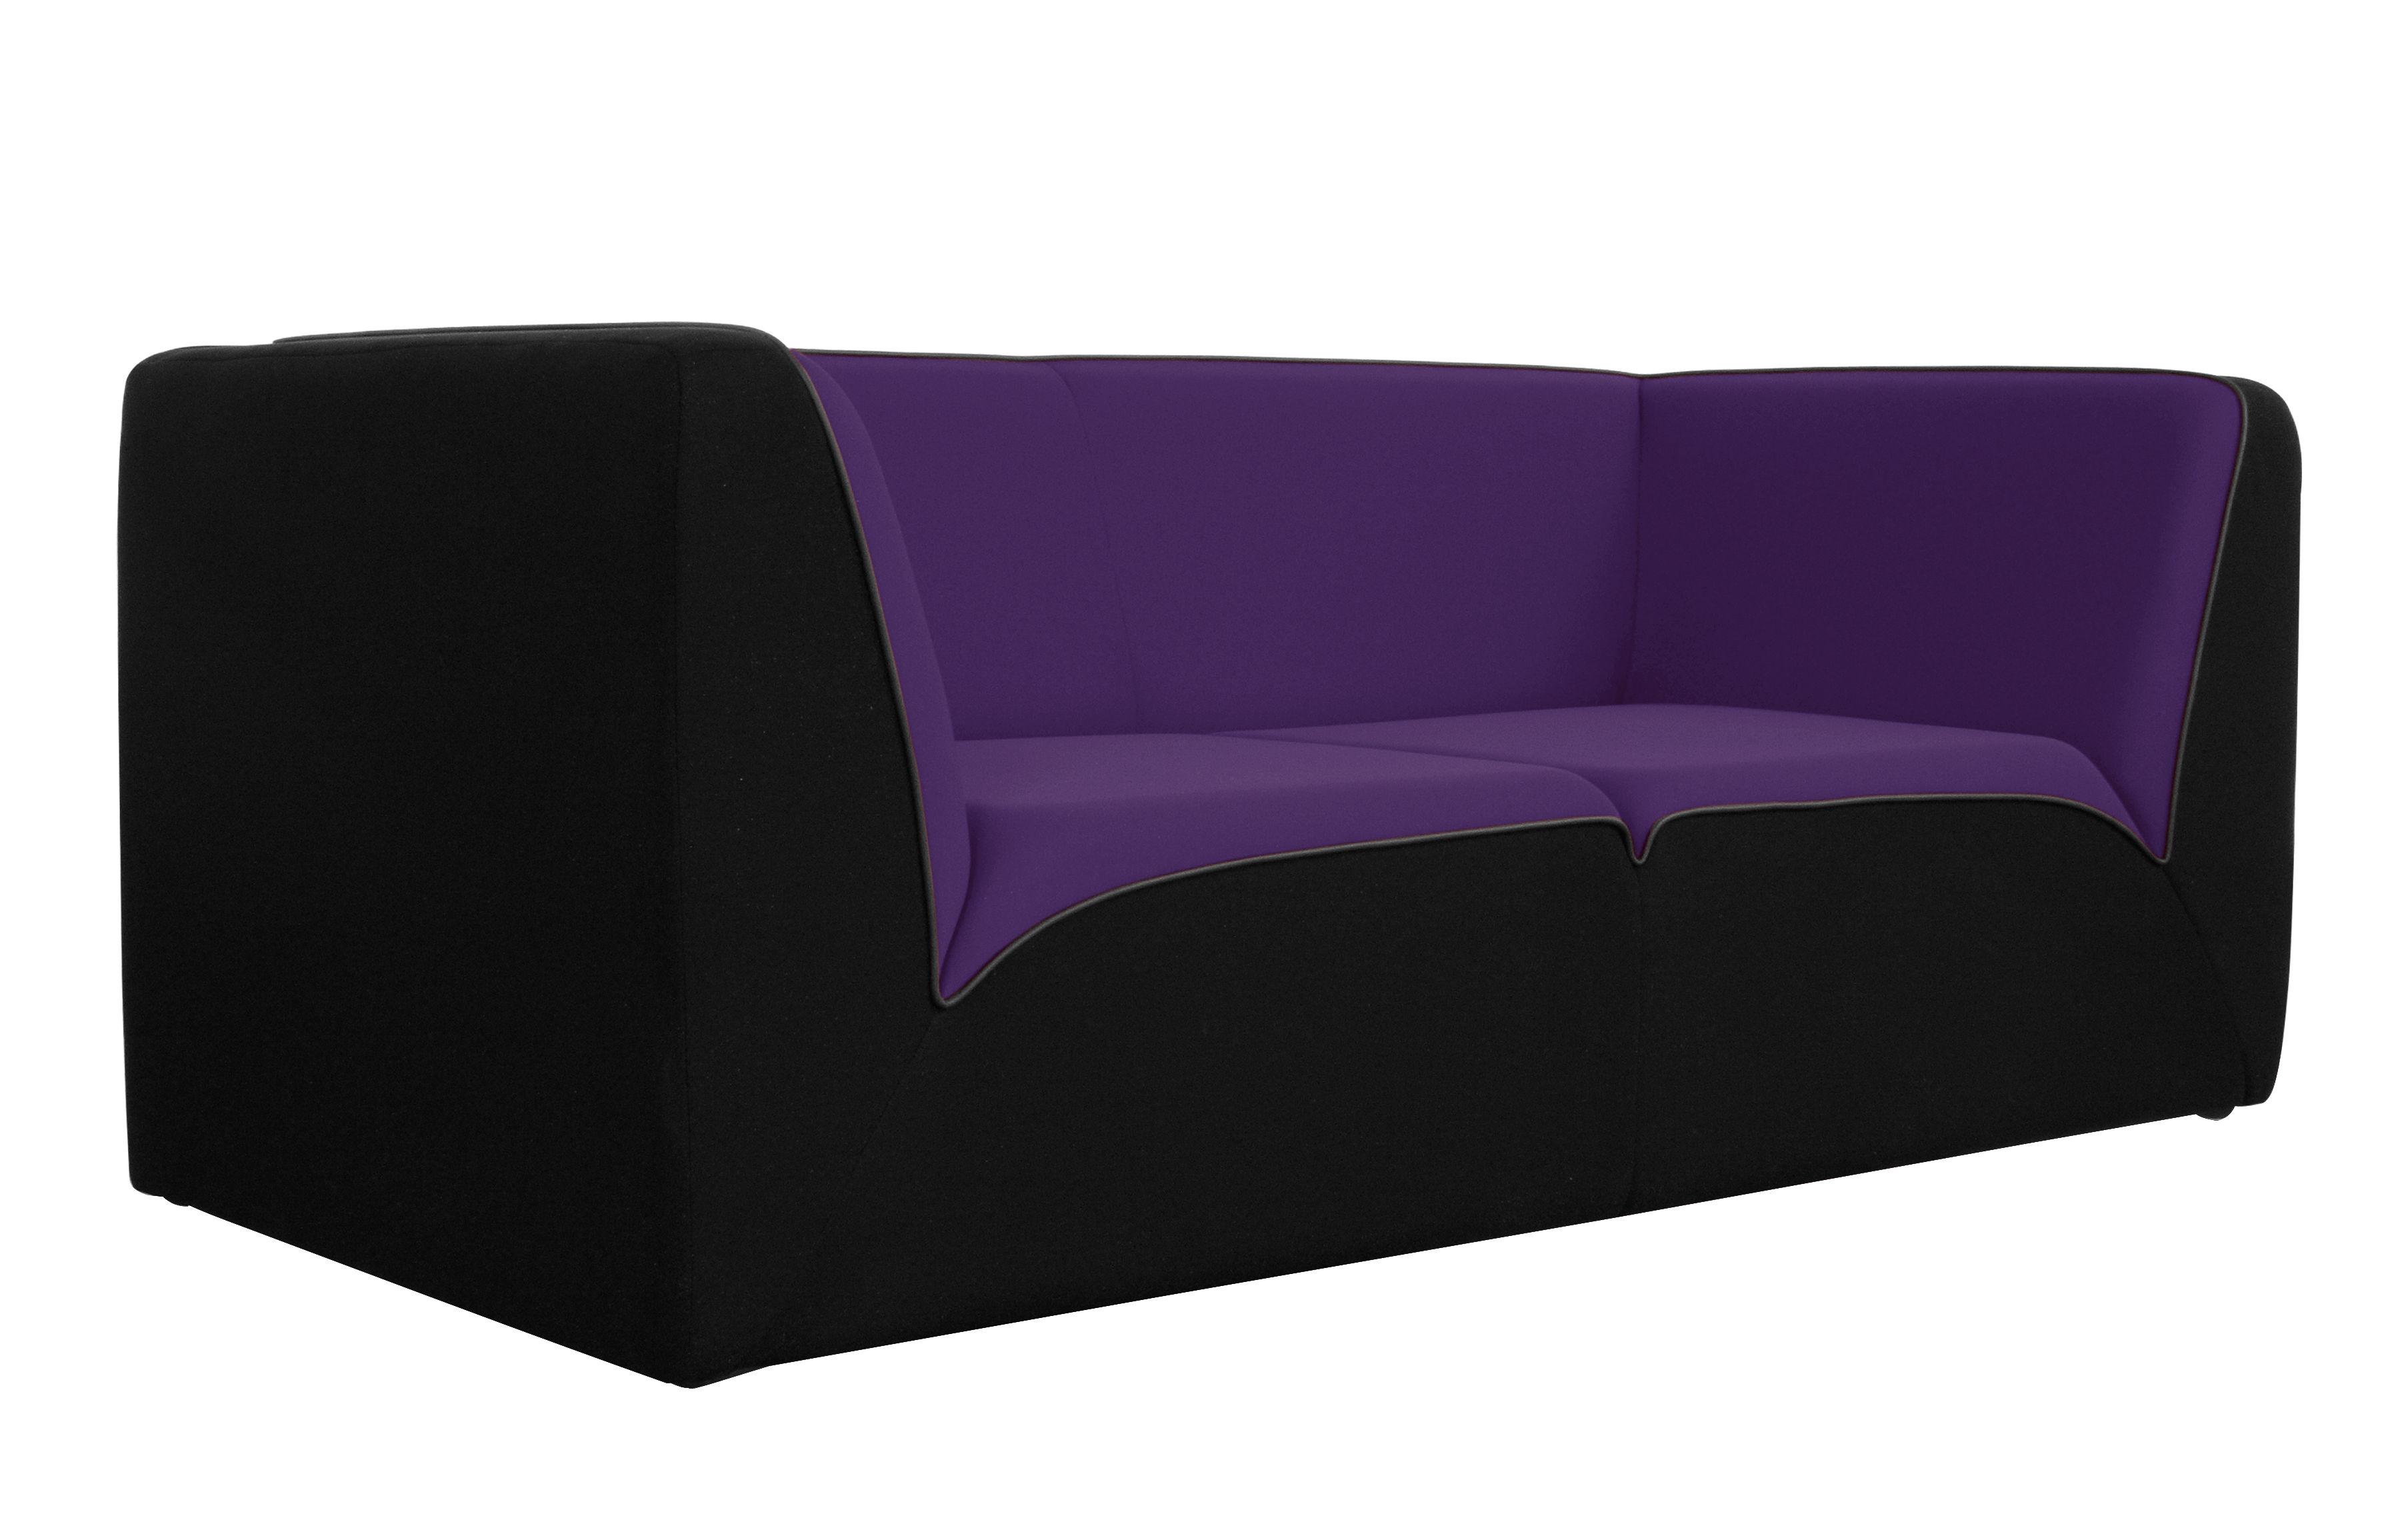 Canap droit e motion by ora ito 3 places l 189 cm noir violet passep - Canape dunlopillo ora ito ...